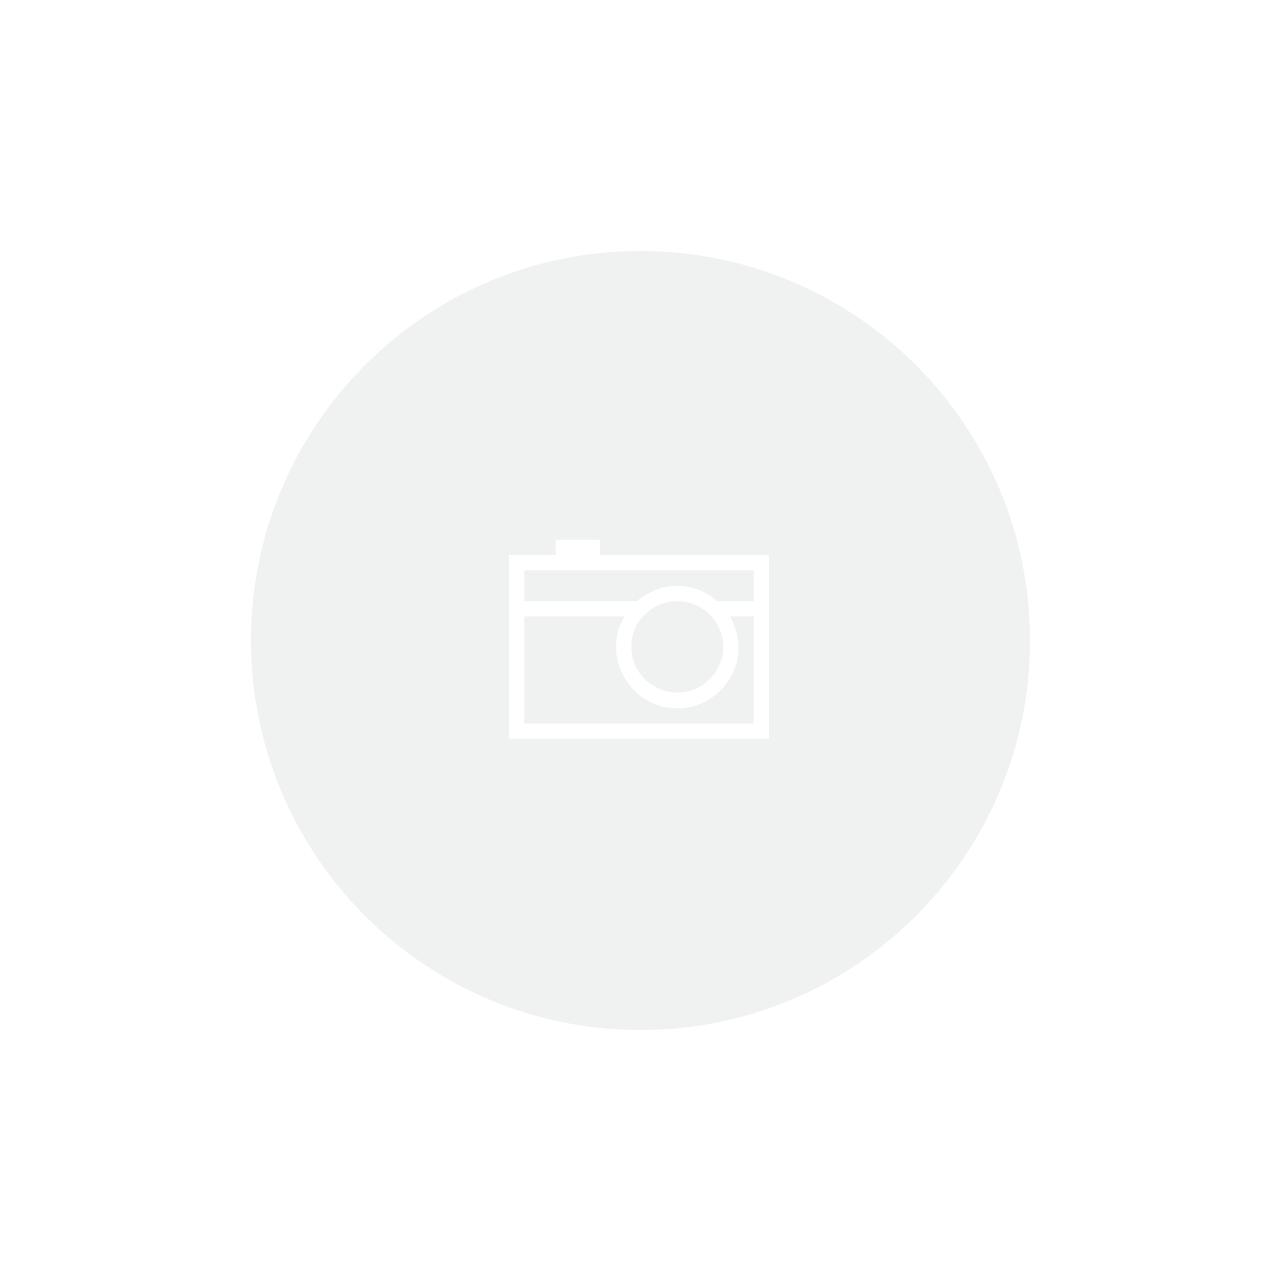 Placa de Vídeo XFX Radeon RX 550 2GB GDDR5 1203MHZ CORE DP RX-550P2SFG5